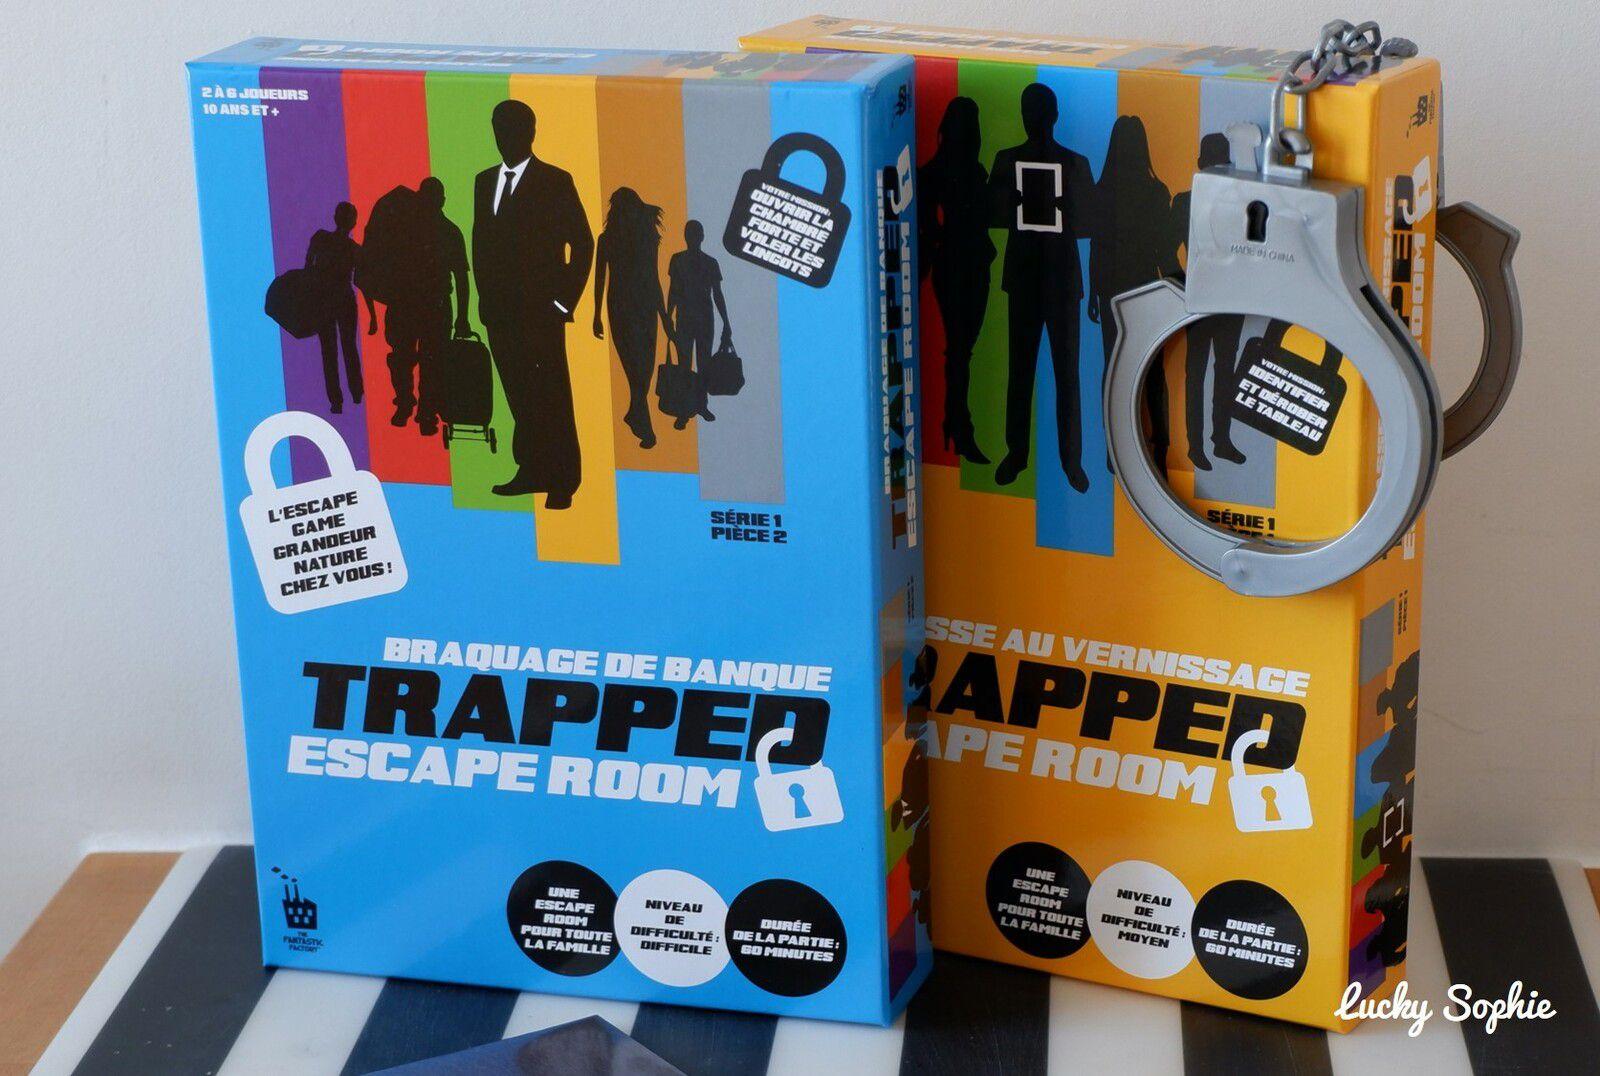 Escape room Trapped : super escape game à la maison !